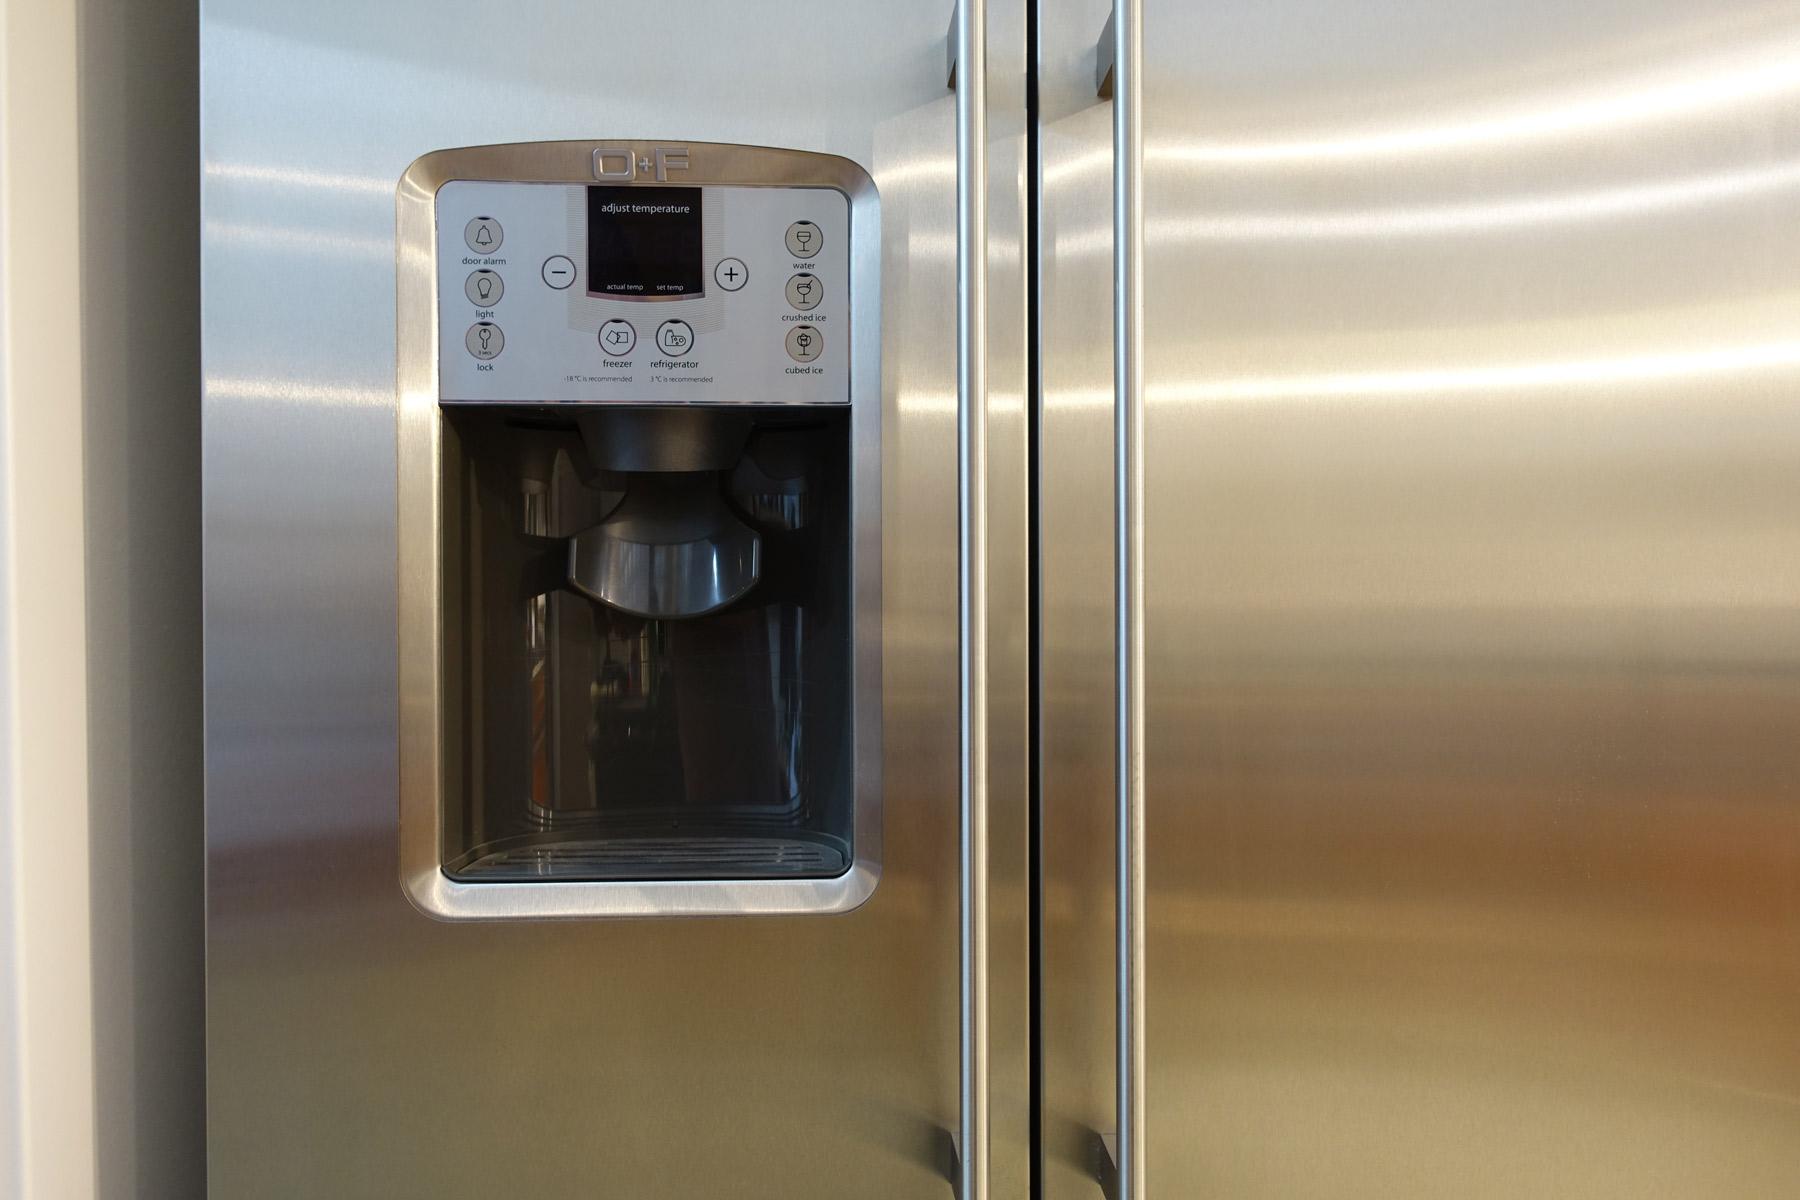 Side By Side Kühlschrank Crushed Ice : O f classic side by side kühlschrank mit dispenser welter